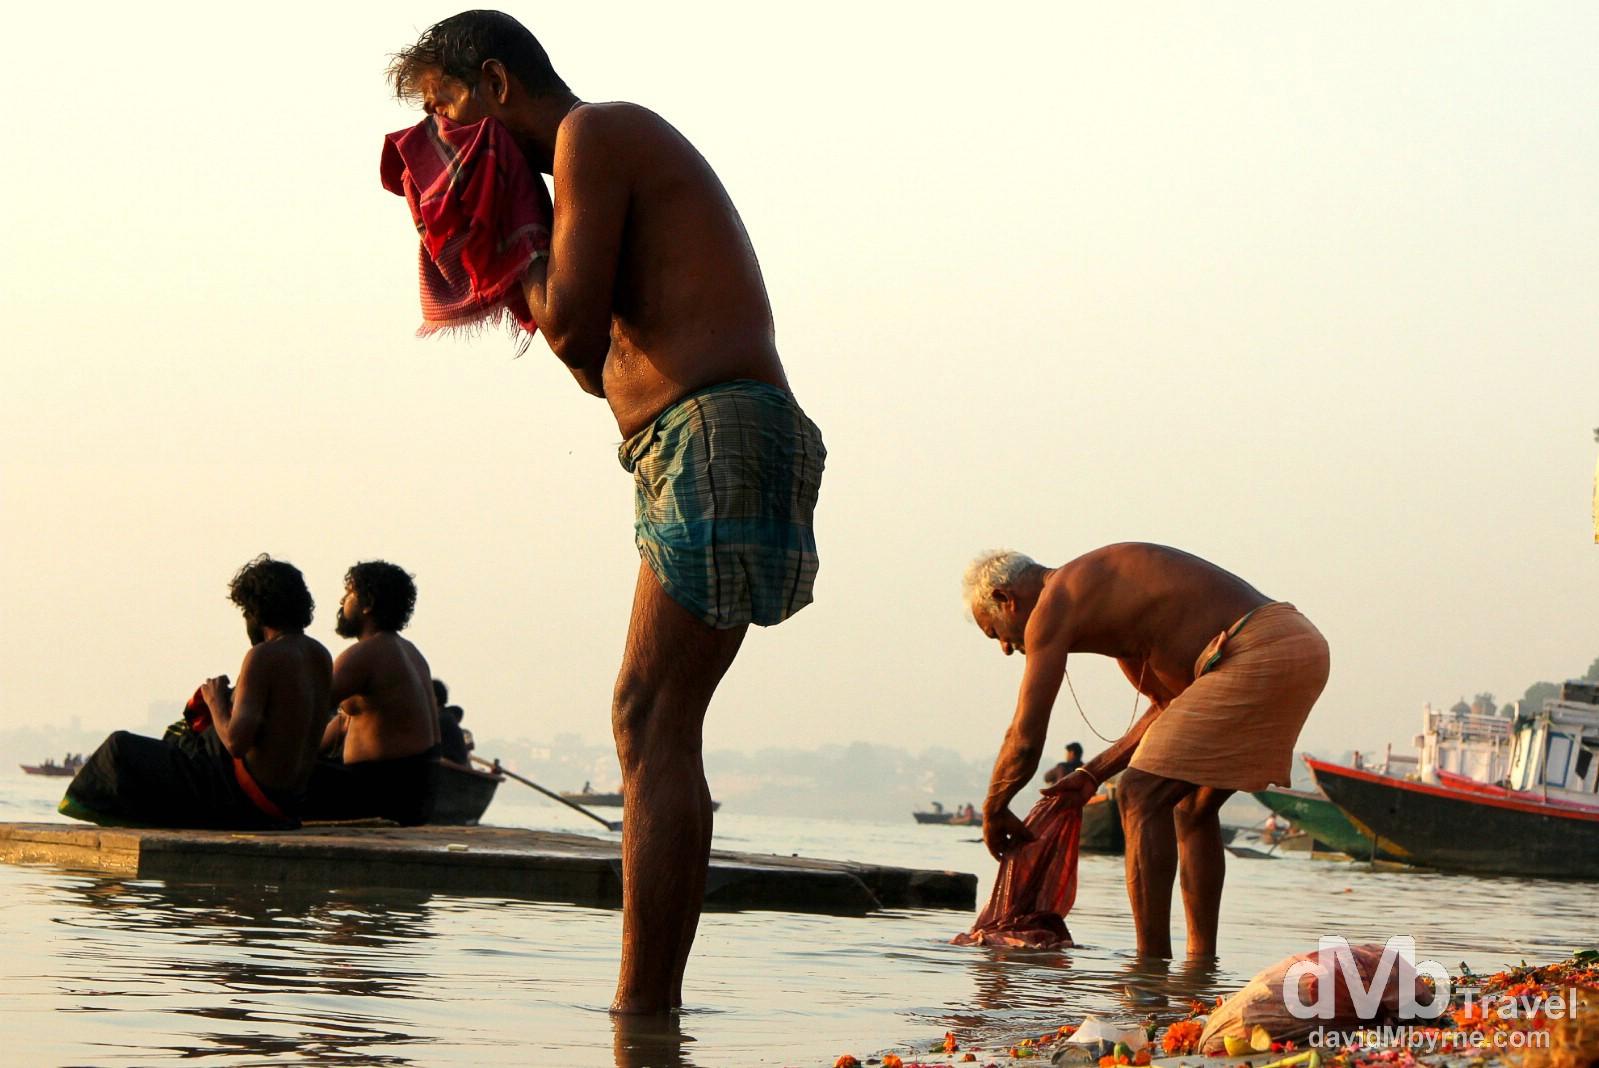 Sunrise bathing in the River Ganges, Varanasi, Uttar Pradesh, India. October 13th 2012.